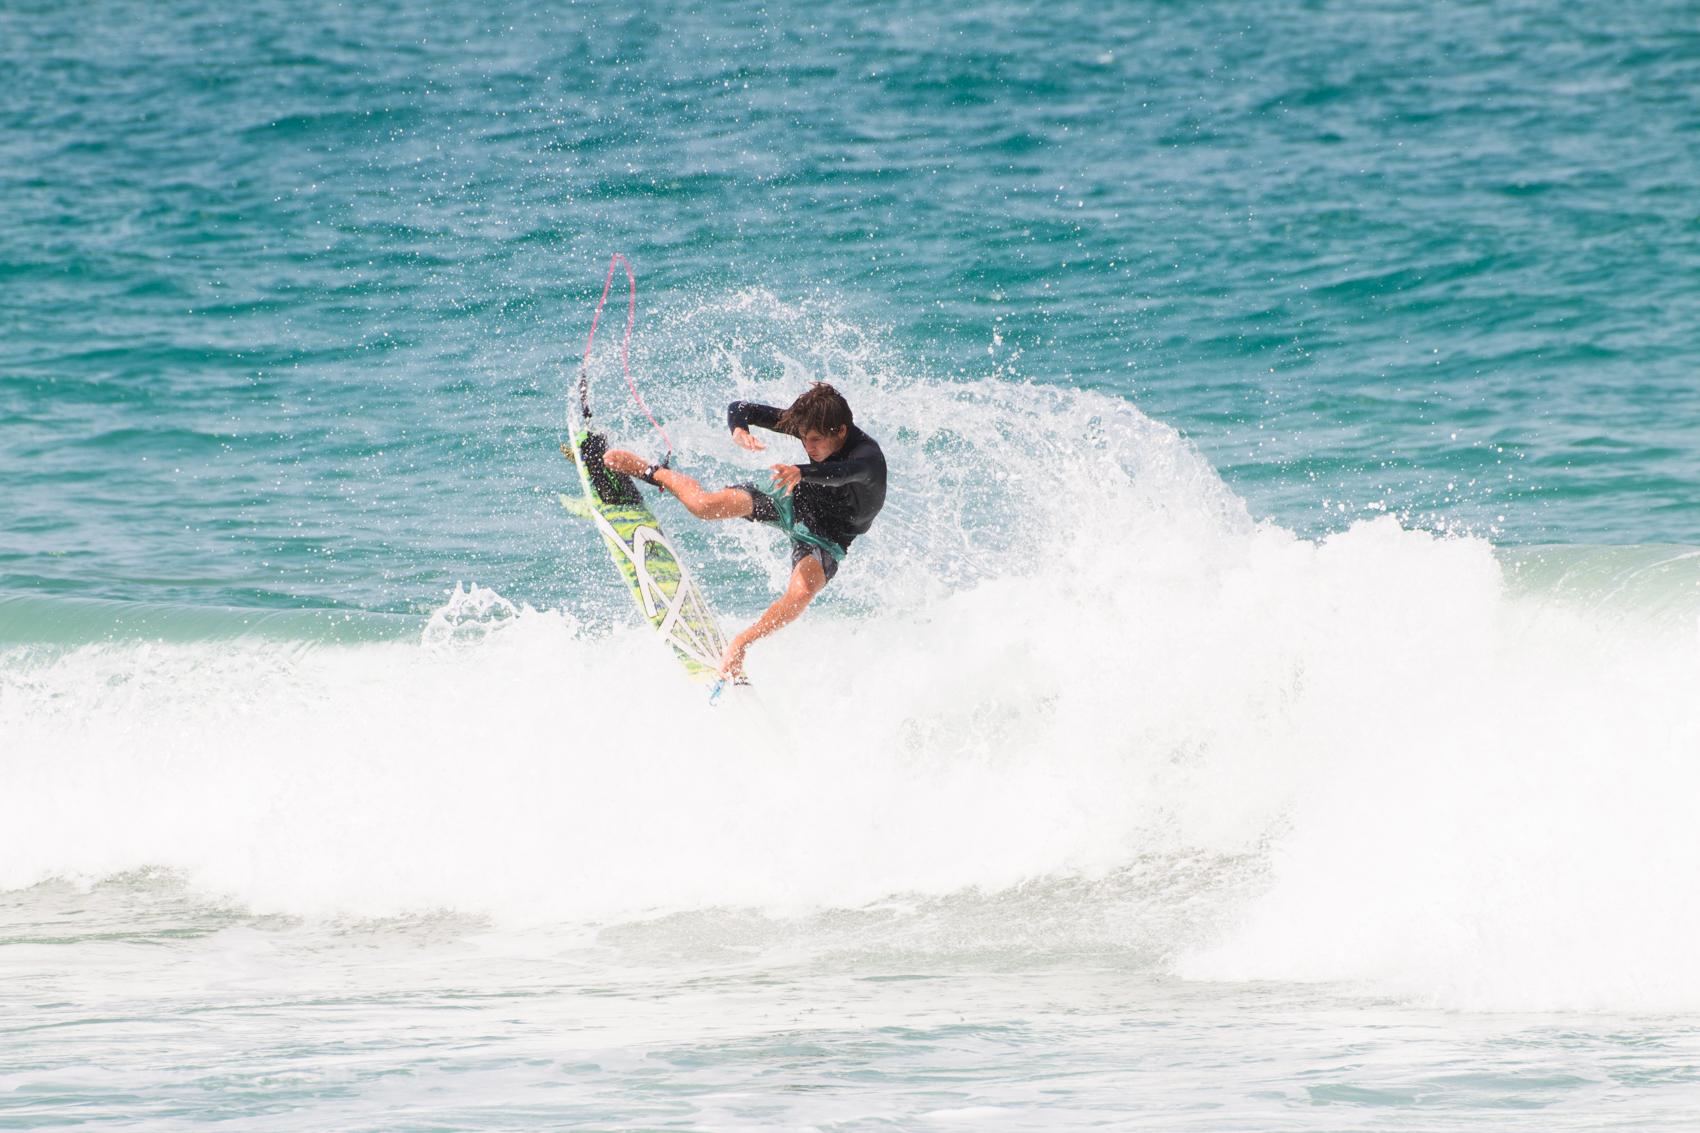 Chase Modelski surfing at Sebastian Inlet, Florida. Photos By Nathaniel Harrington.